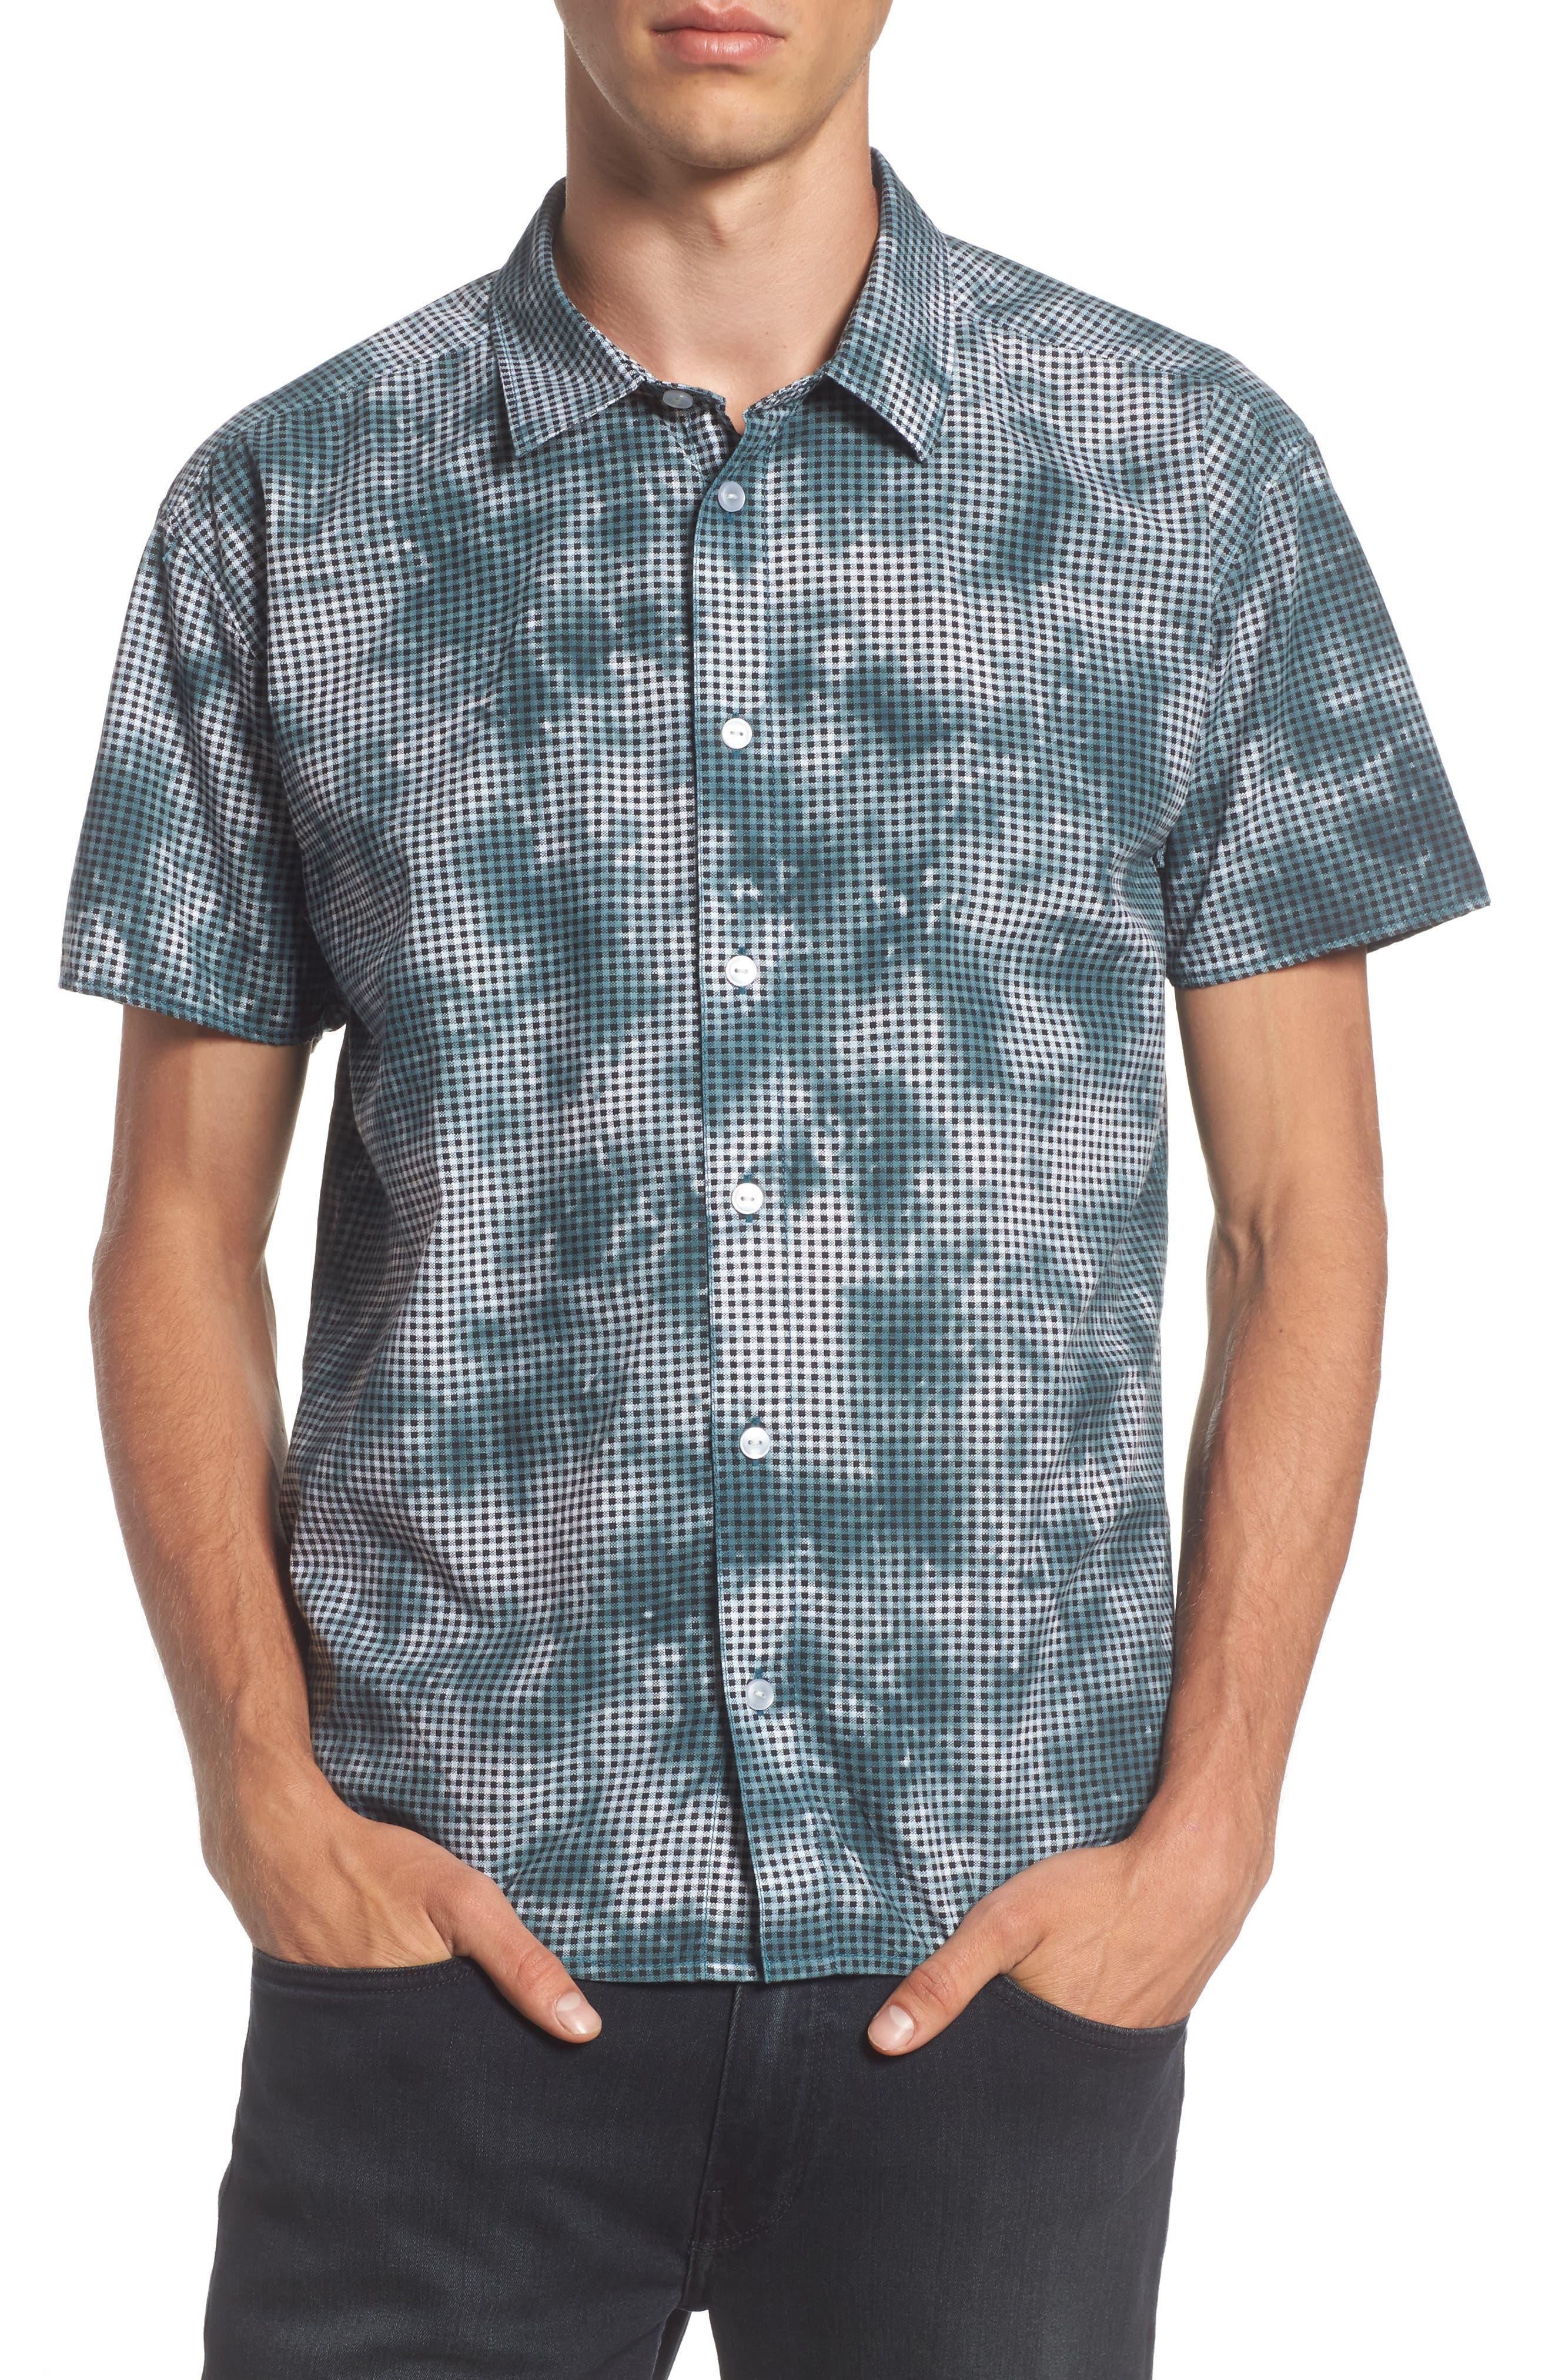 RVCA Tie Dye Check Shirt